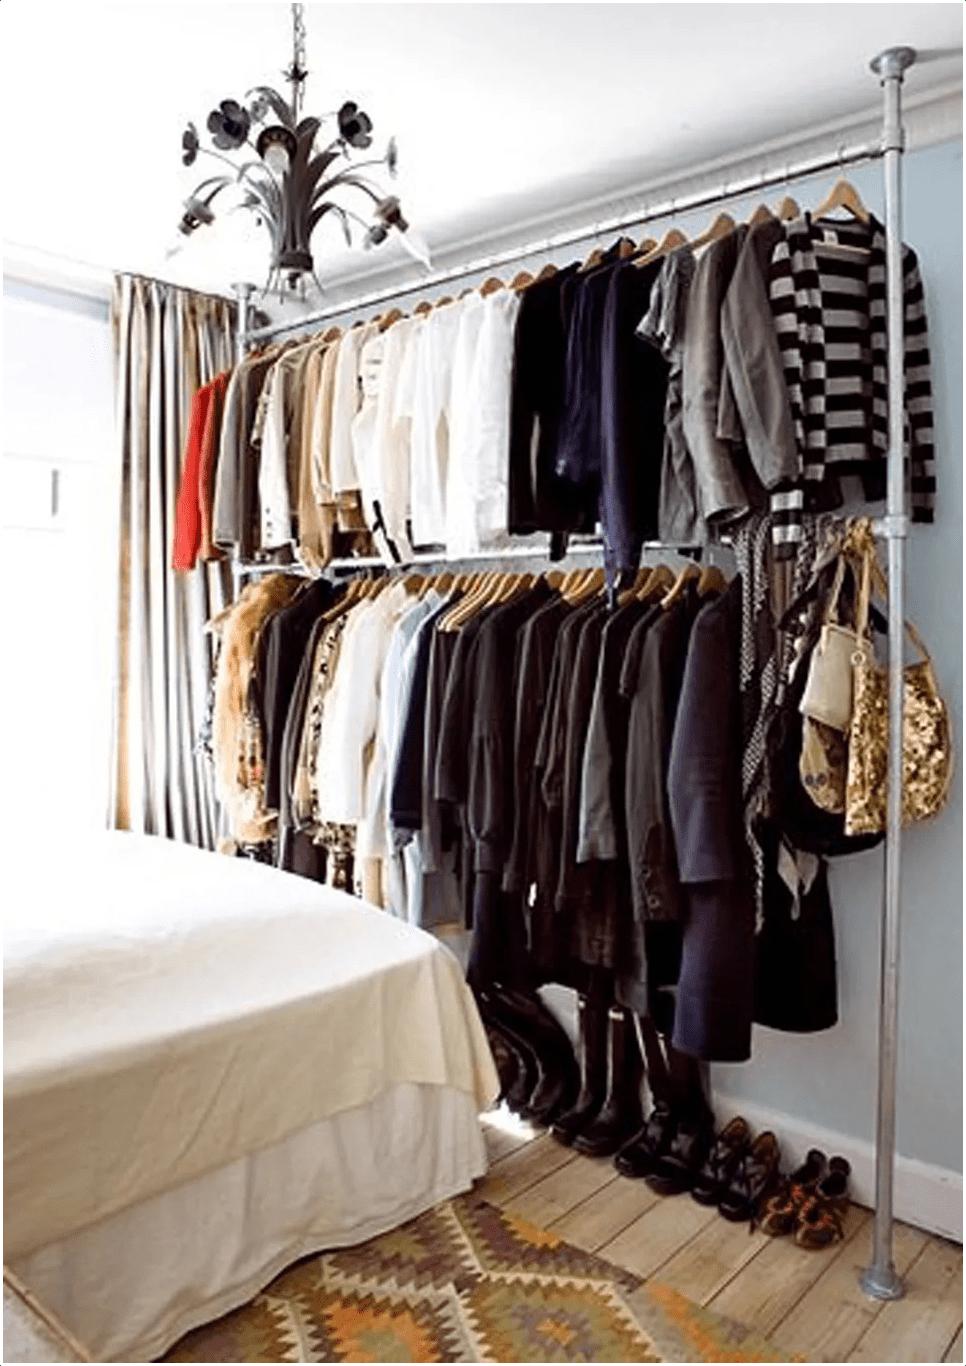 5.Simphome.com A DIY Pipe Closet Rod idea